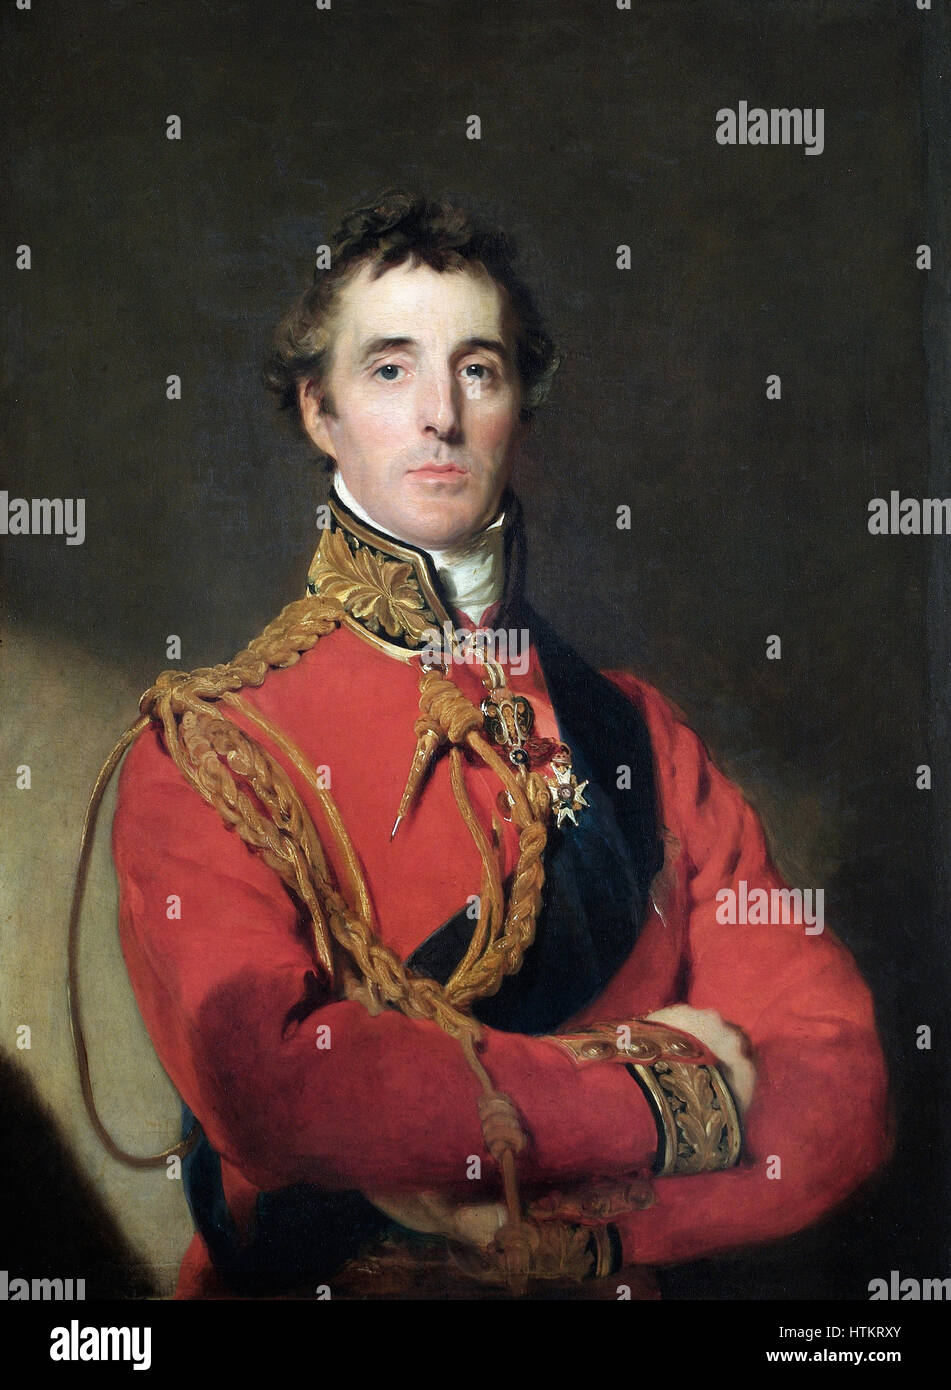 Sir Arthur Wellesley, 1st Duke of Wellington - Stock Image